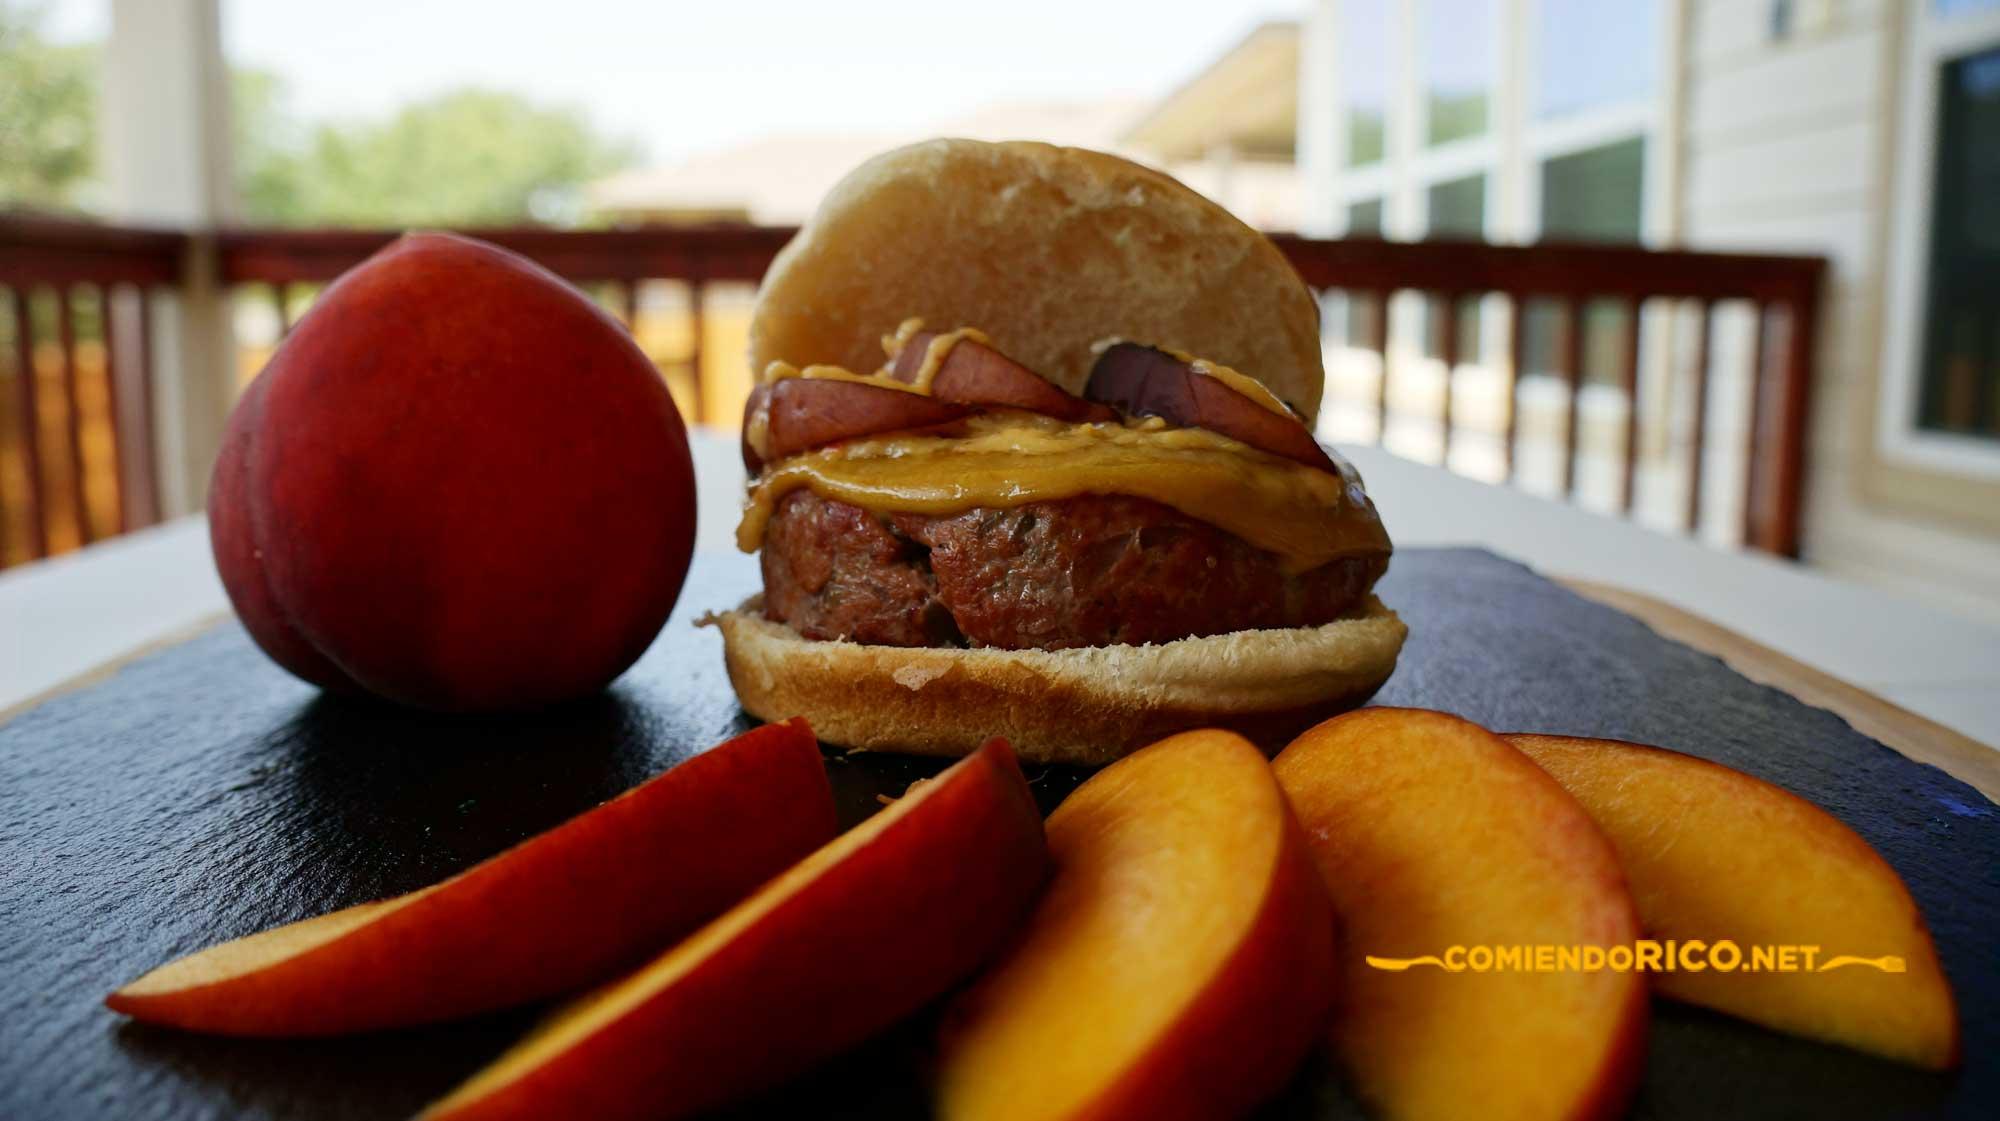 hamburguesa con duraznos, comiendo rico